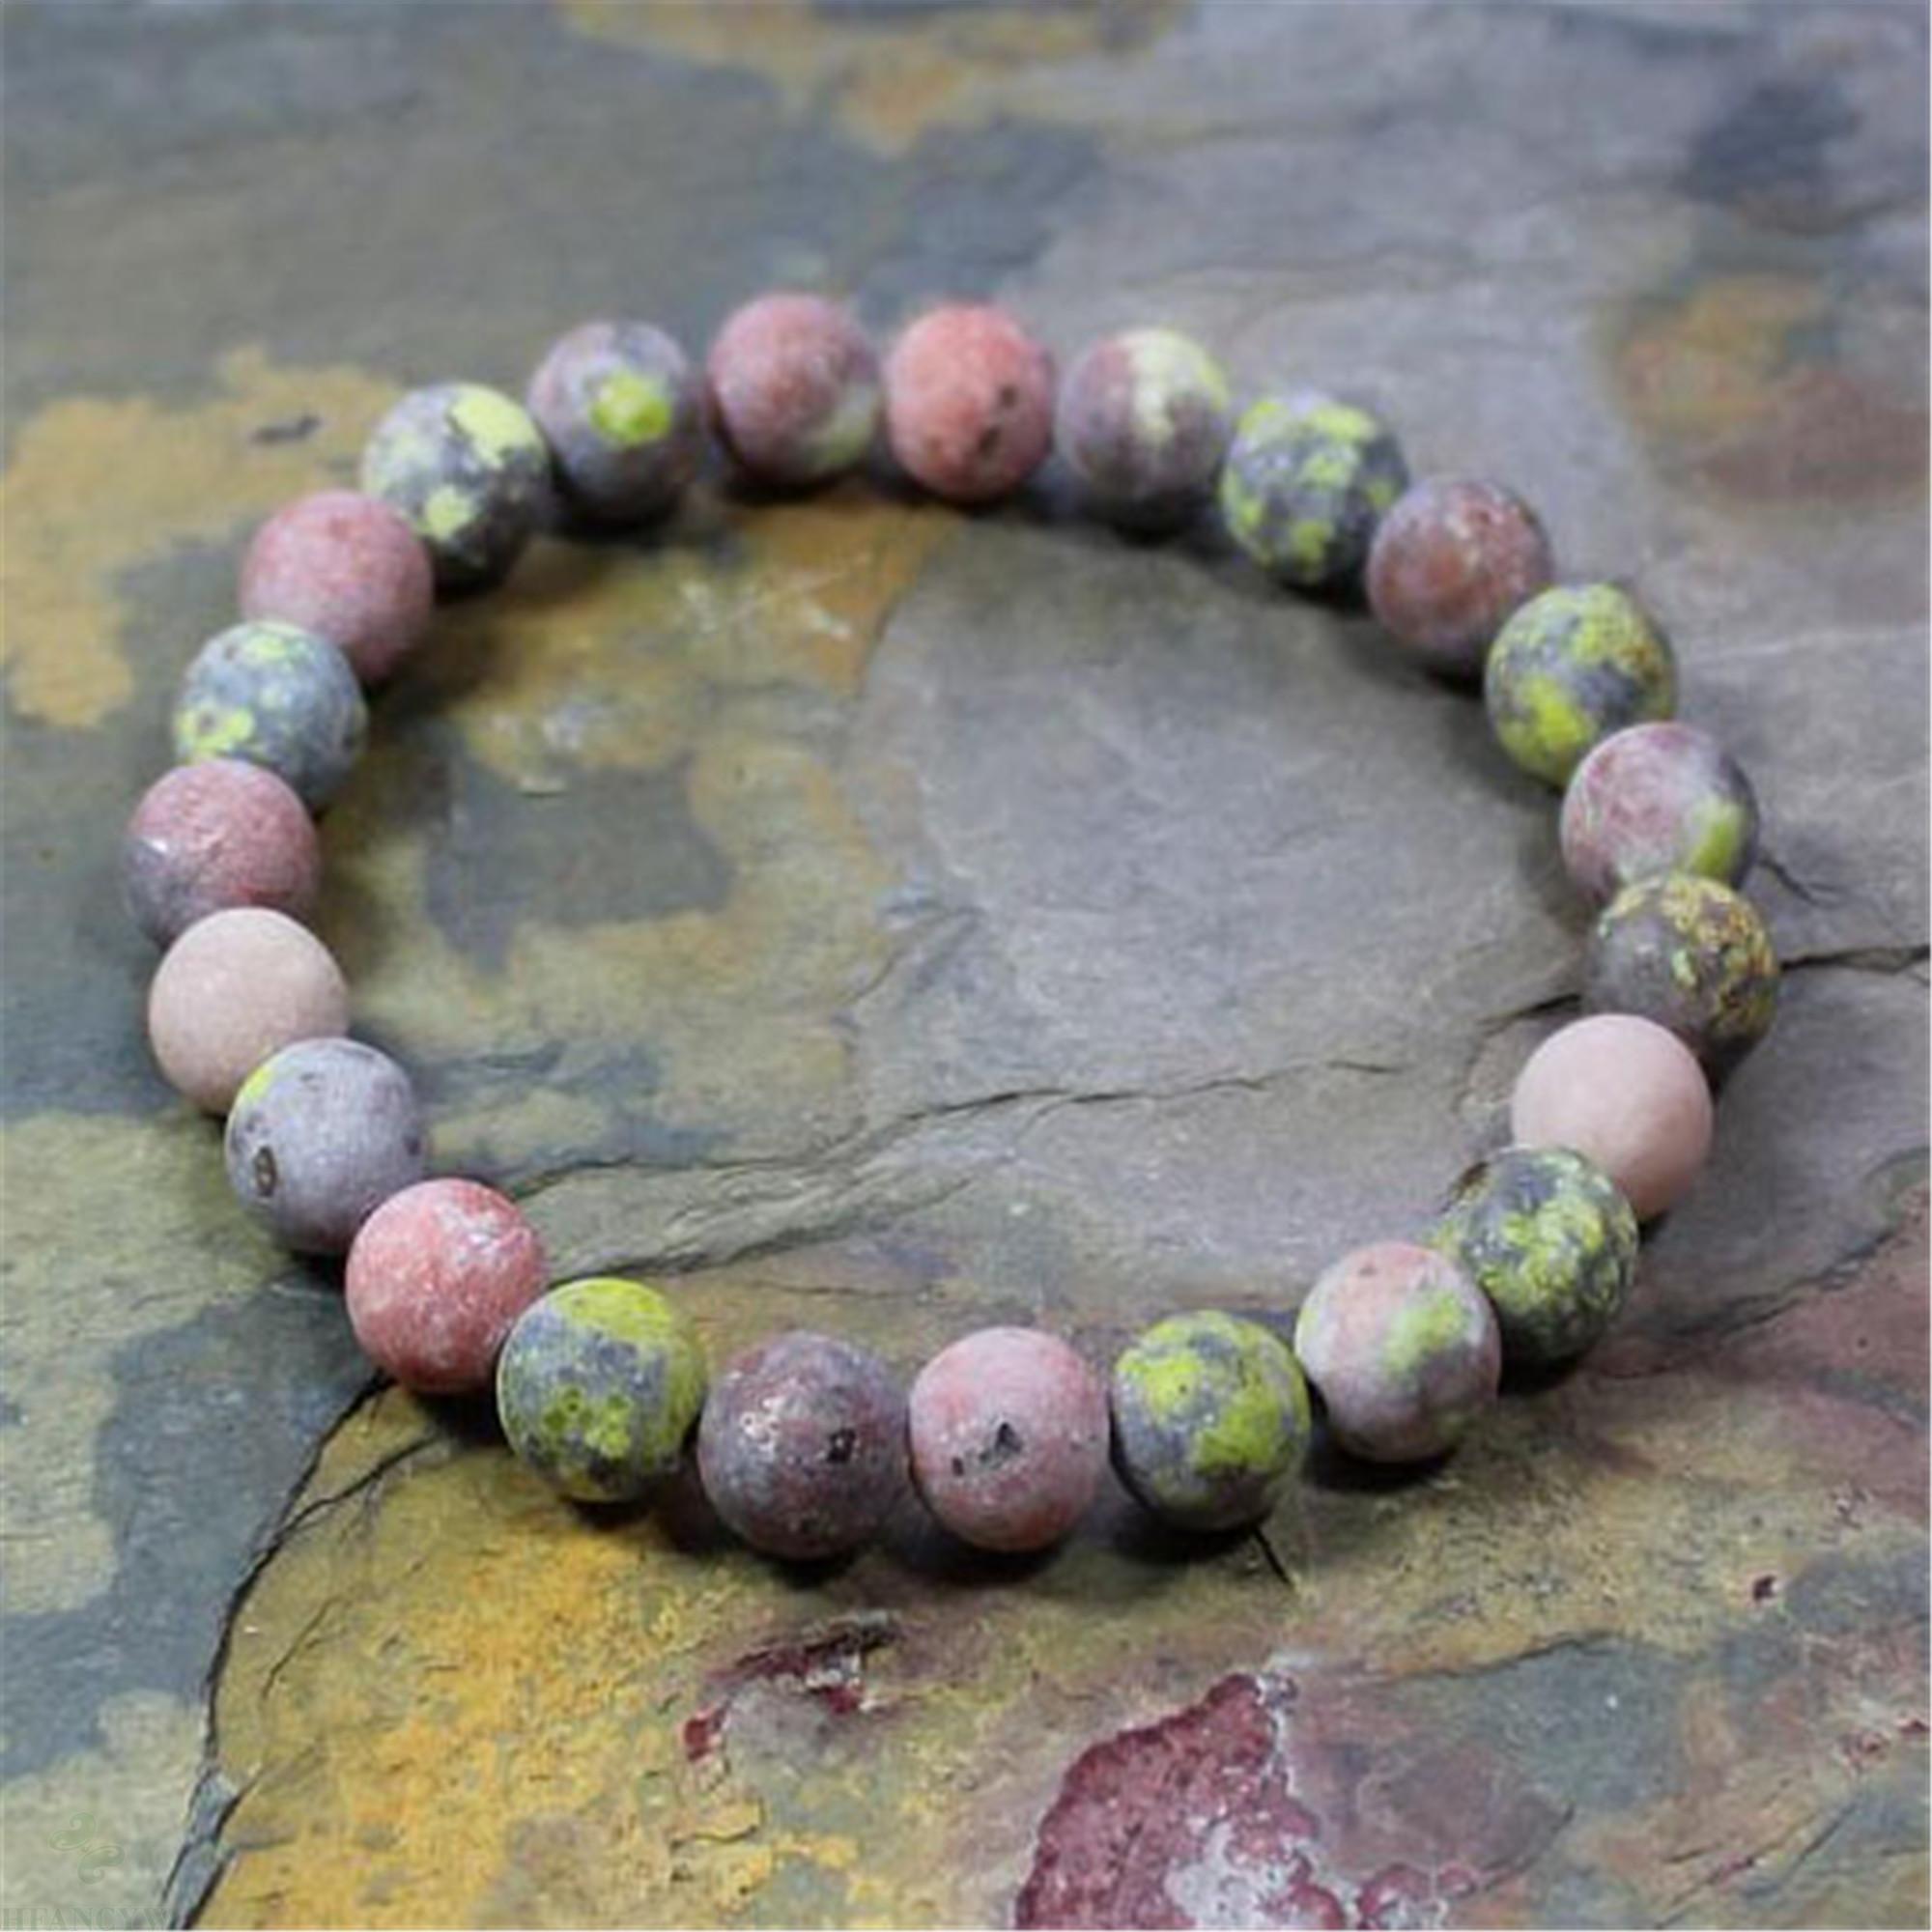 8mm natürliche Lepidolite Handgemachte Mala Armband Chakas Glücks Cuff Pray Yoga Ruyi Heilung Stretchy Reiki Bless Buddhismus